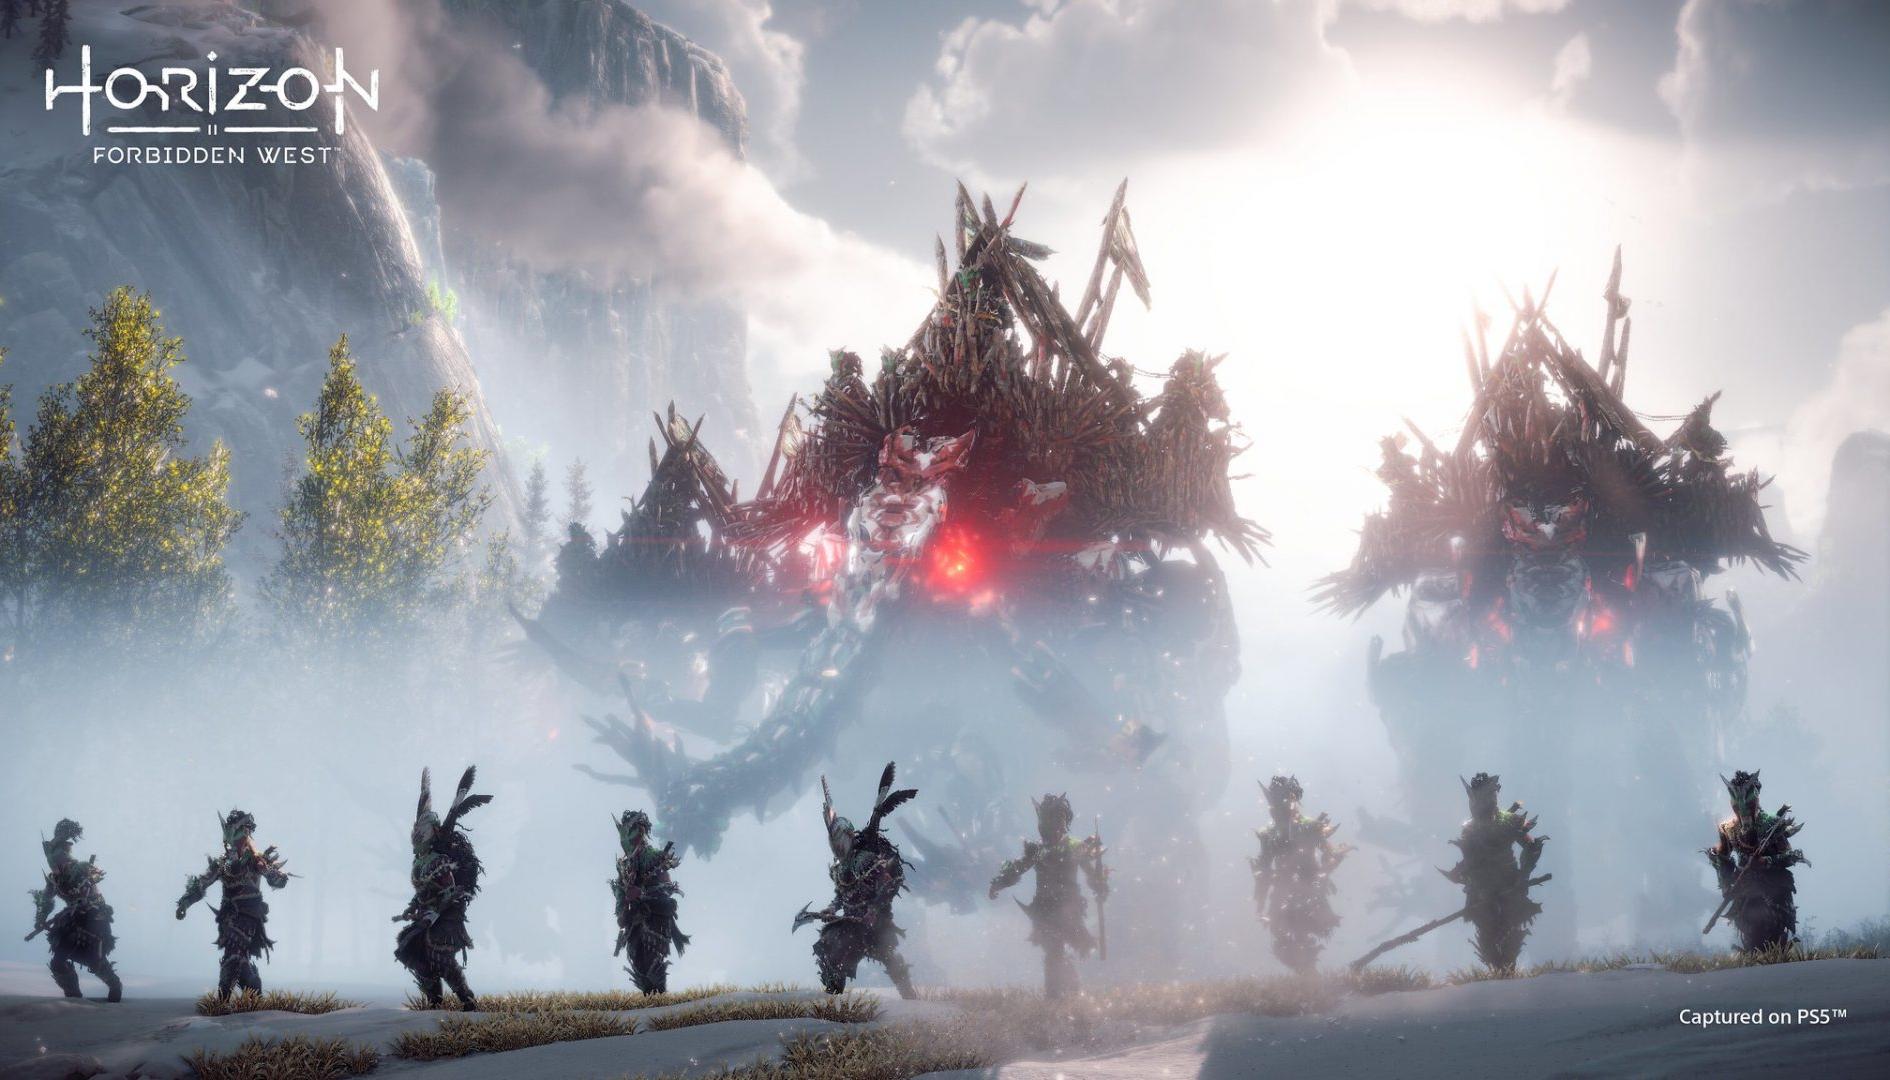 Horizon Forbidden West, confermato l'utilizzo del Ray Tracing su PS5